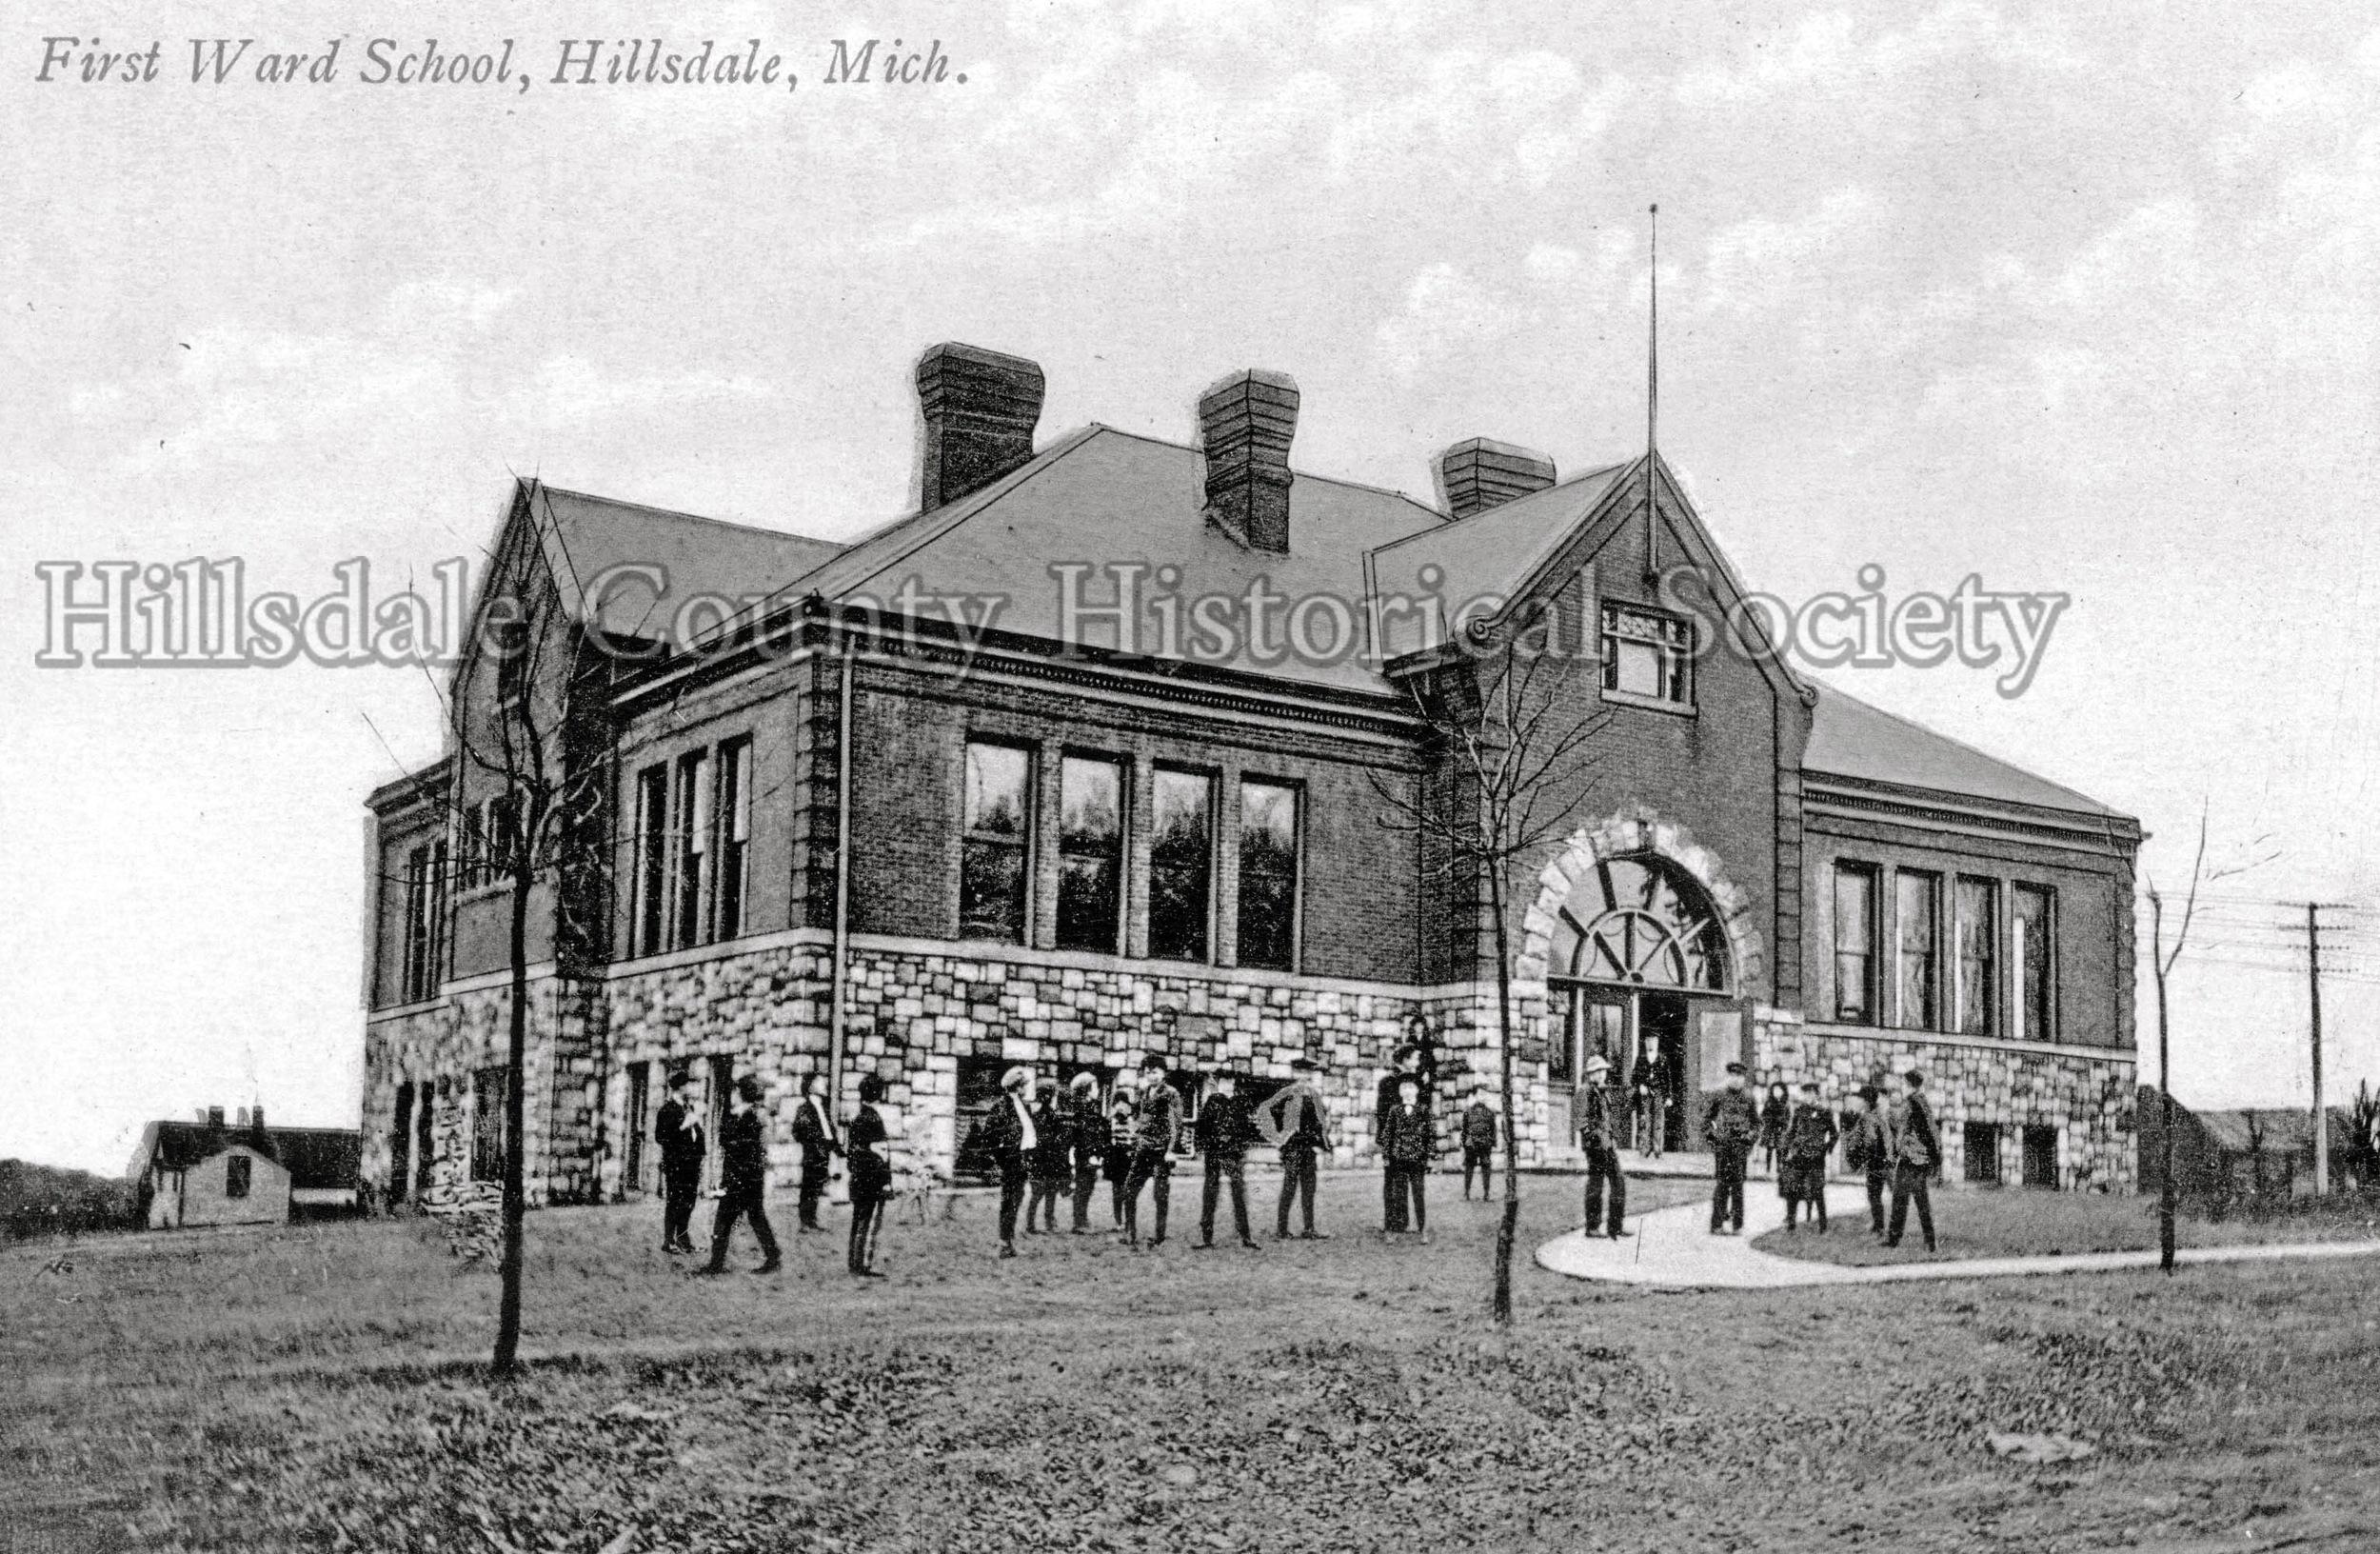 Paul Revere School